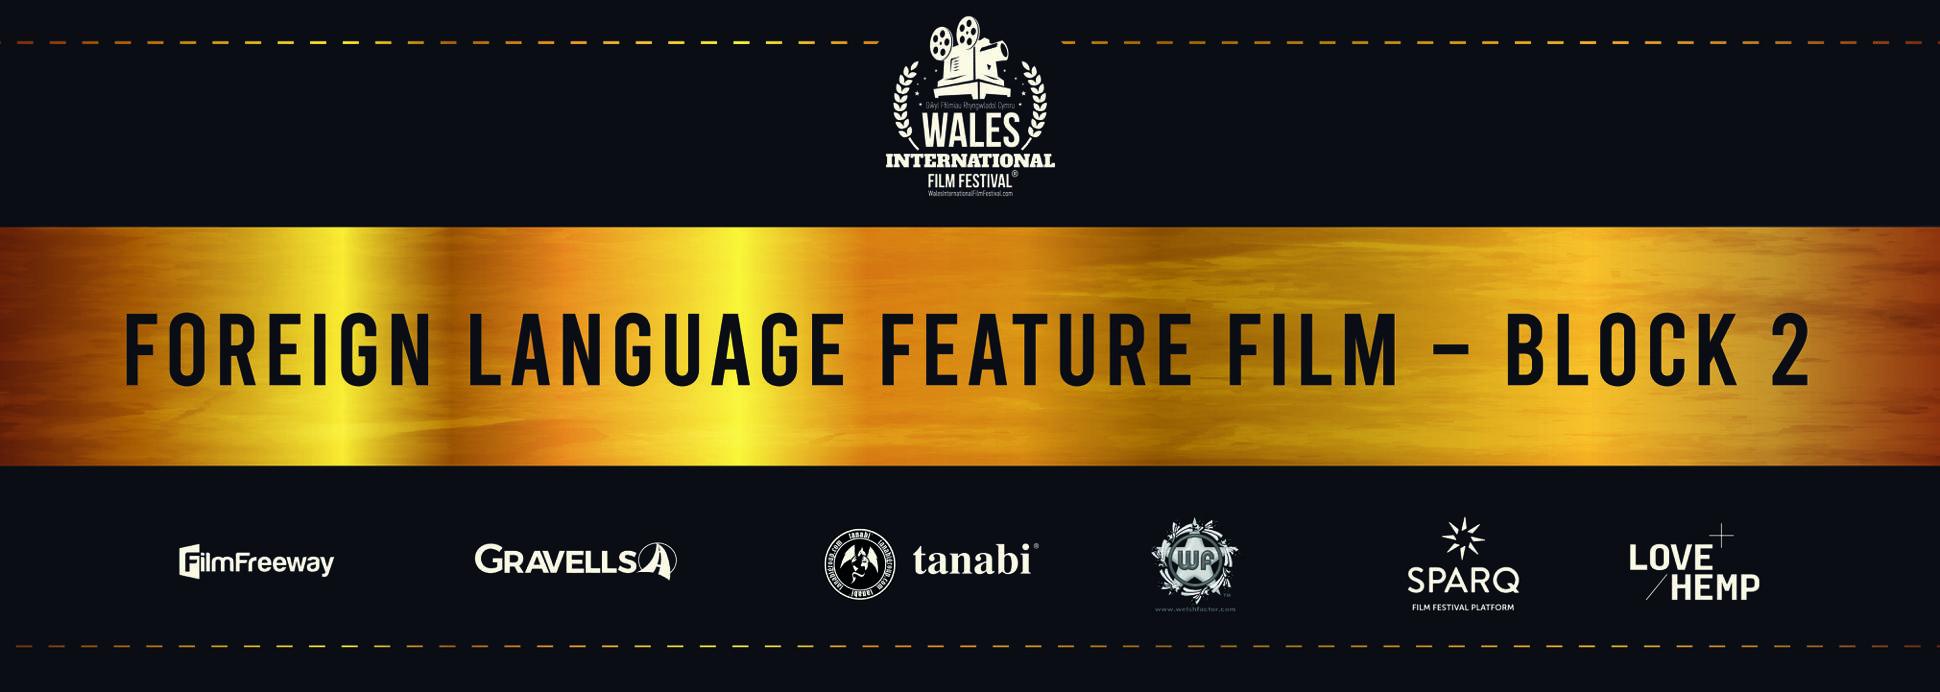 Foreign Language Feature Film - Block 2